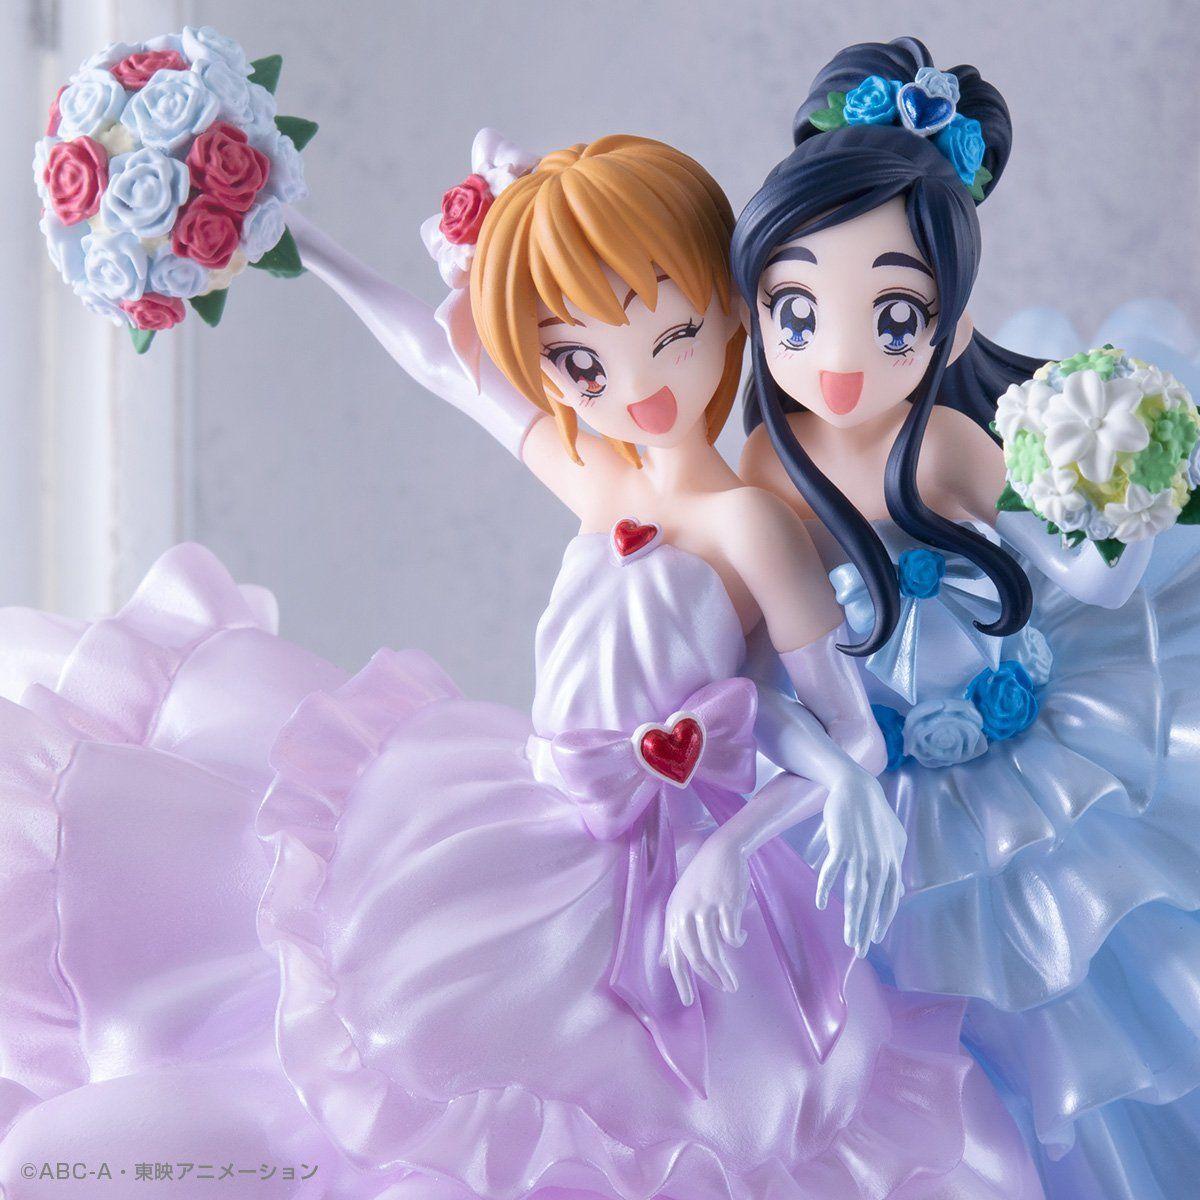 HG GIRLS『ふたりはプリキュアメモリアルフィギュア』完成品フィギュア-005